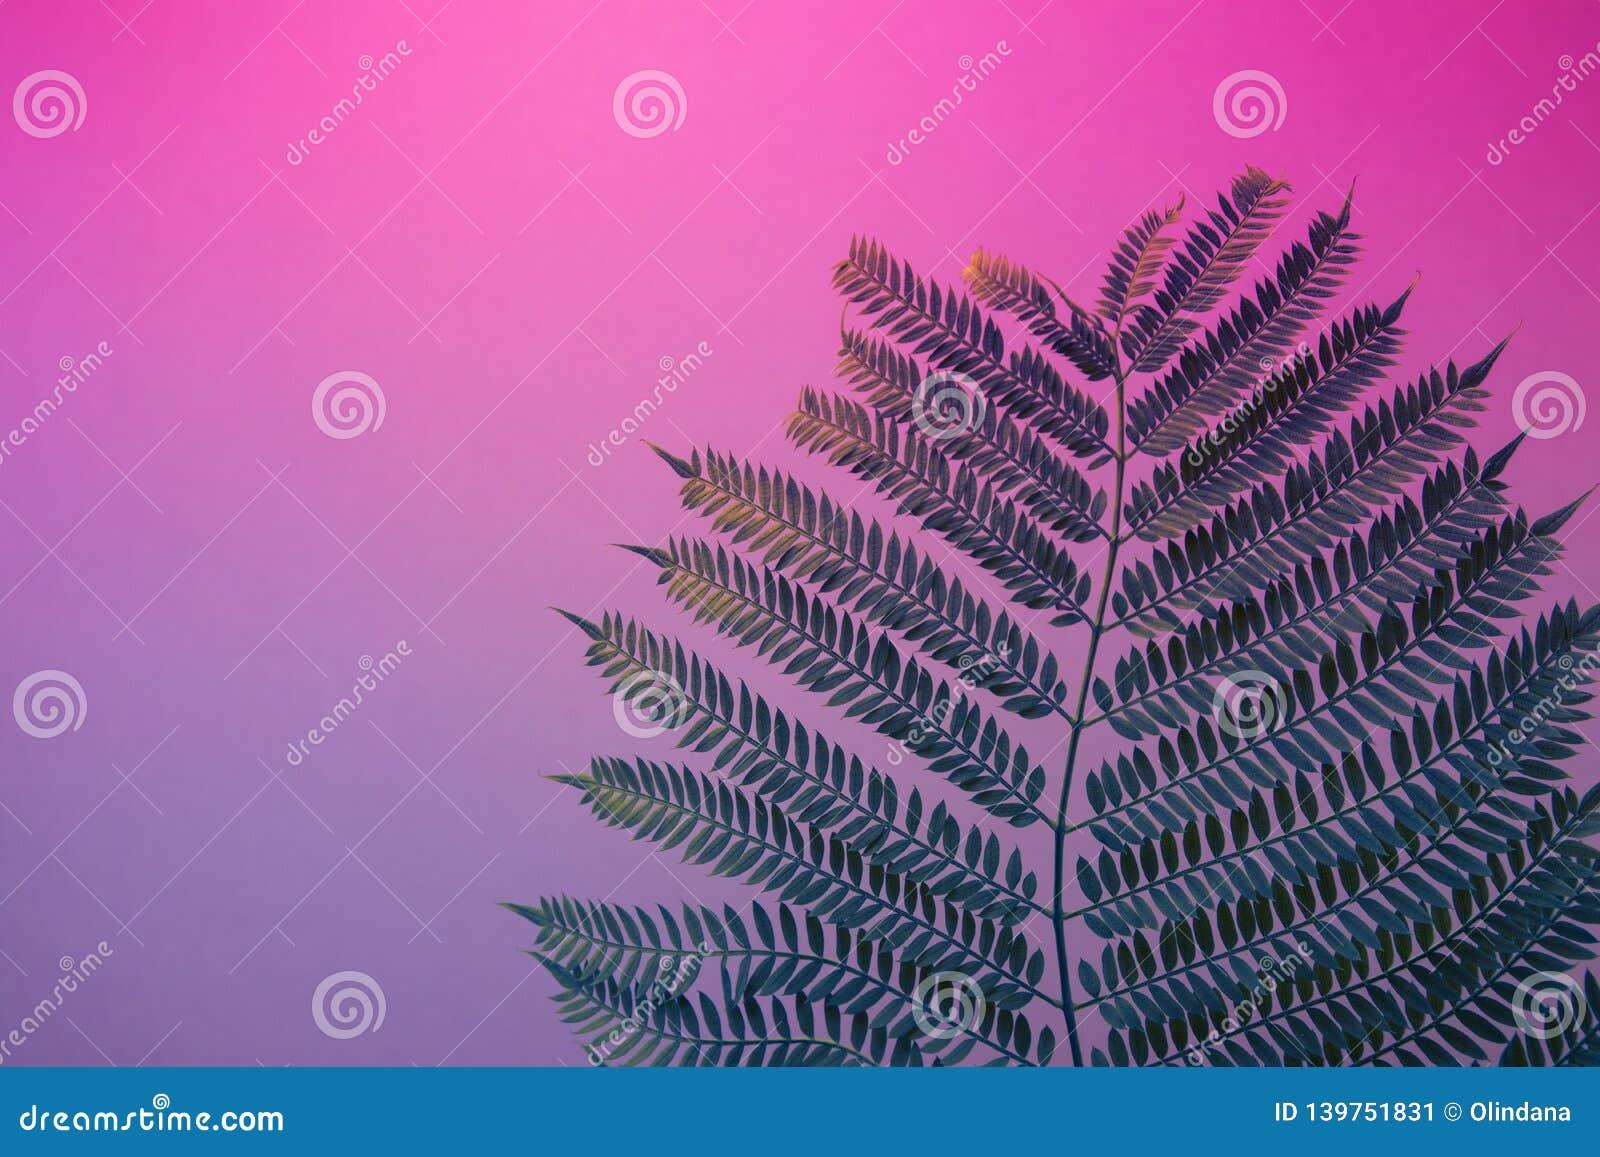 Big fresh fern leaf on duotone purple violet blue background. Trendy neon colors. Toned. Minimalist style. Contemporary unique